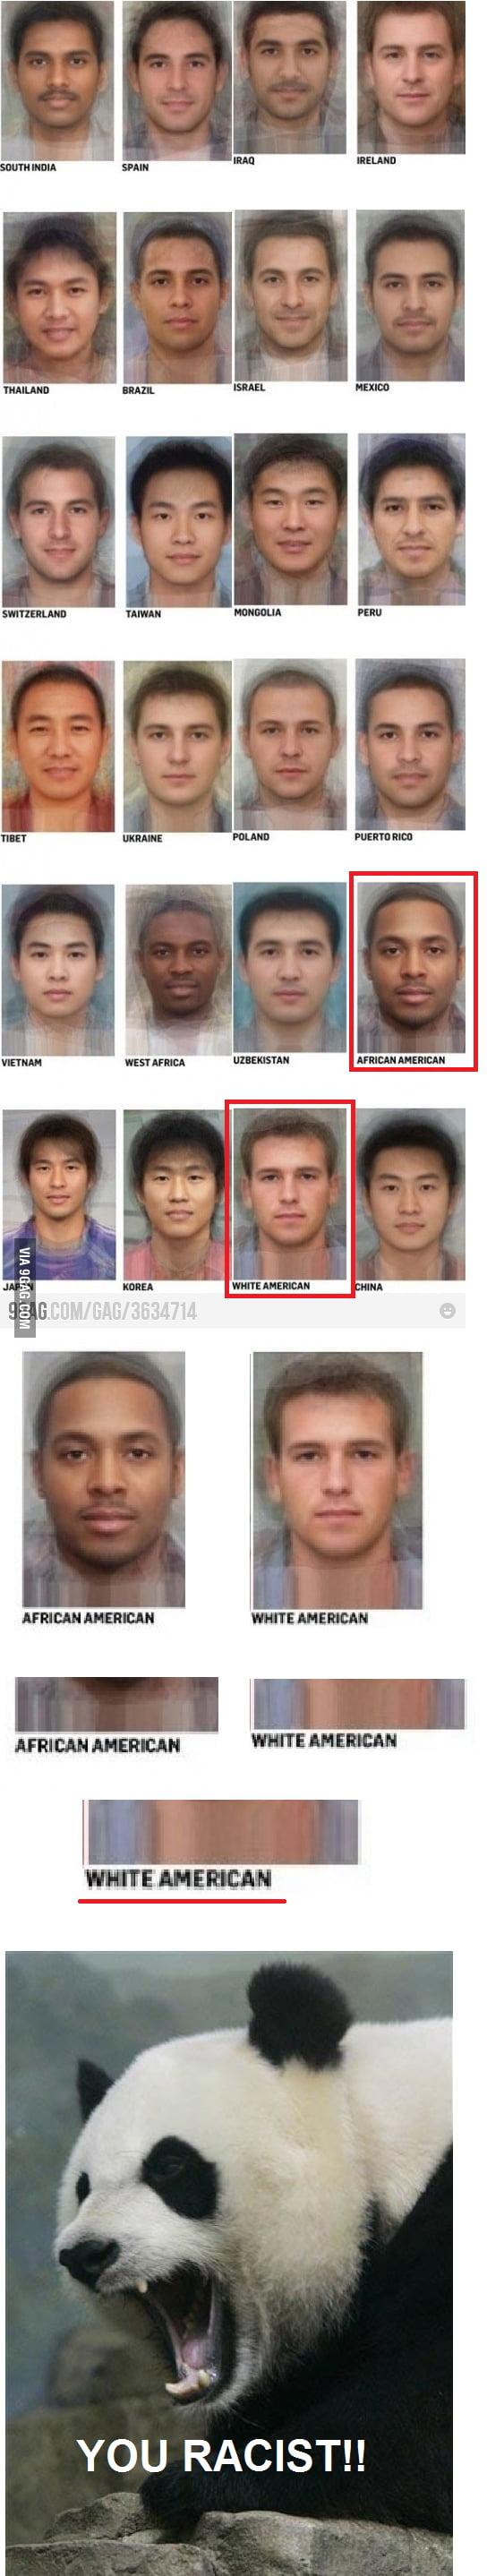 You Racist!!